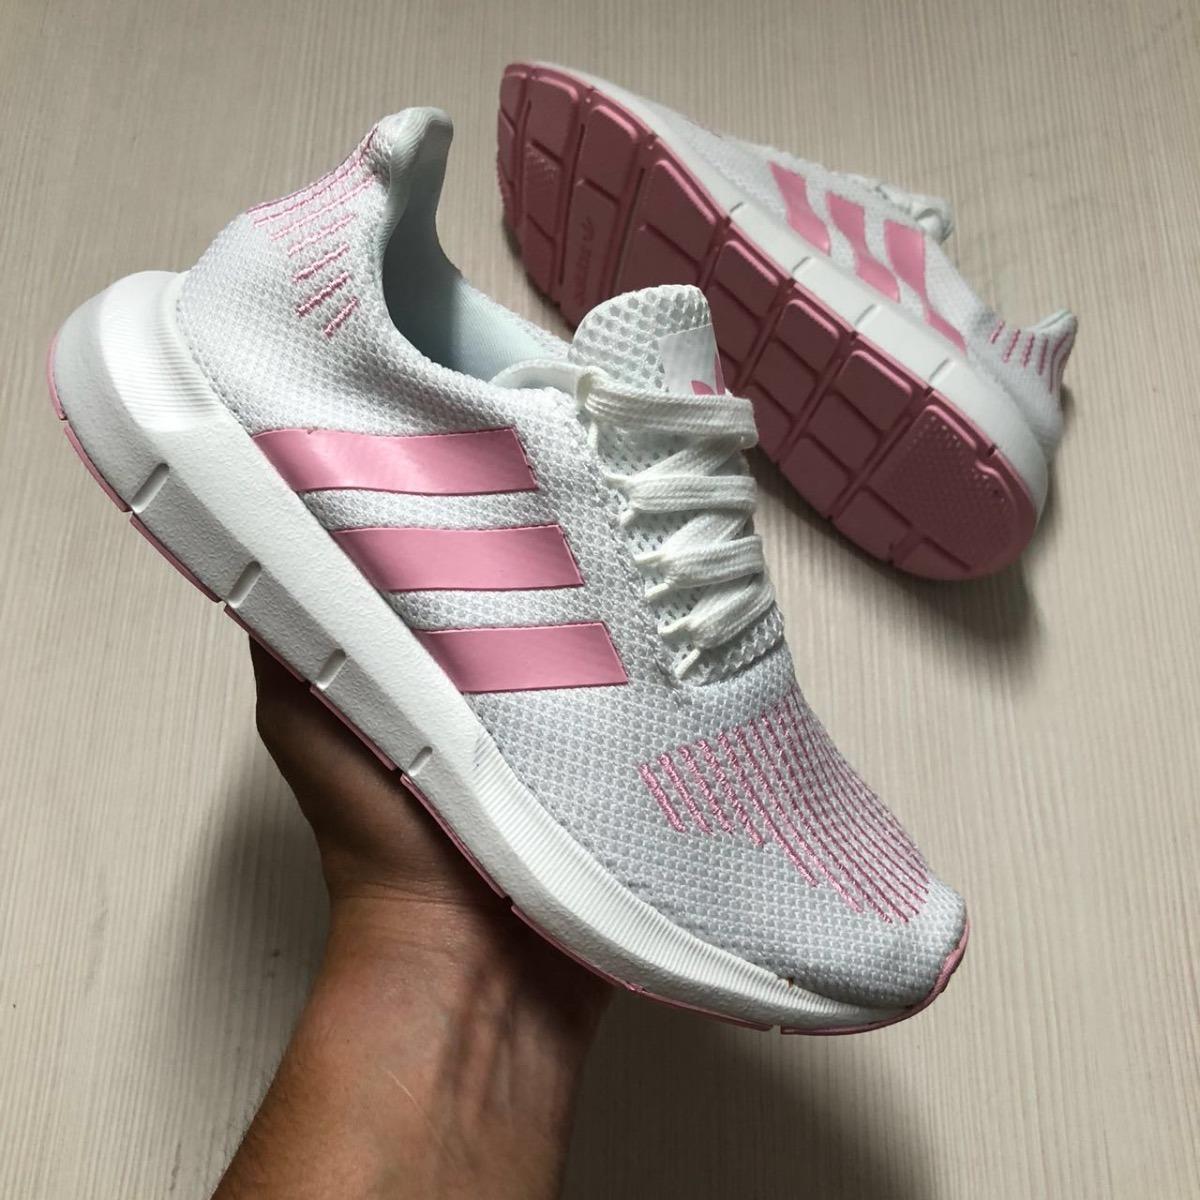 27e7369a24b85 tenis zapatillas adidas swift run blanca rosada mujer env gr. Cargando zoom.